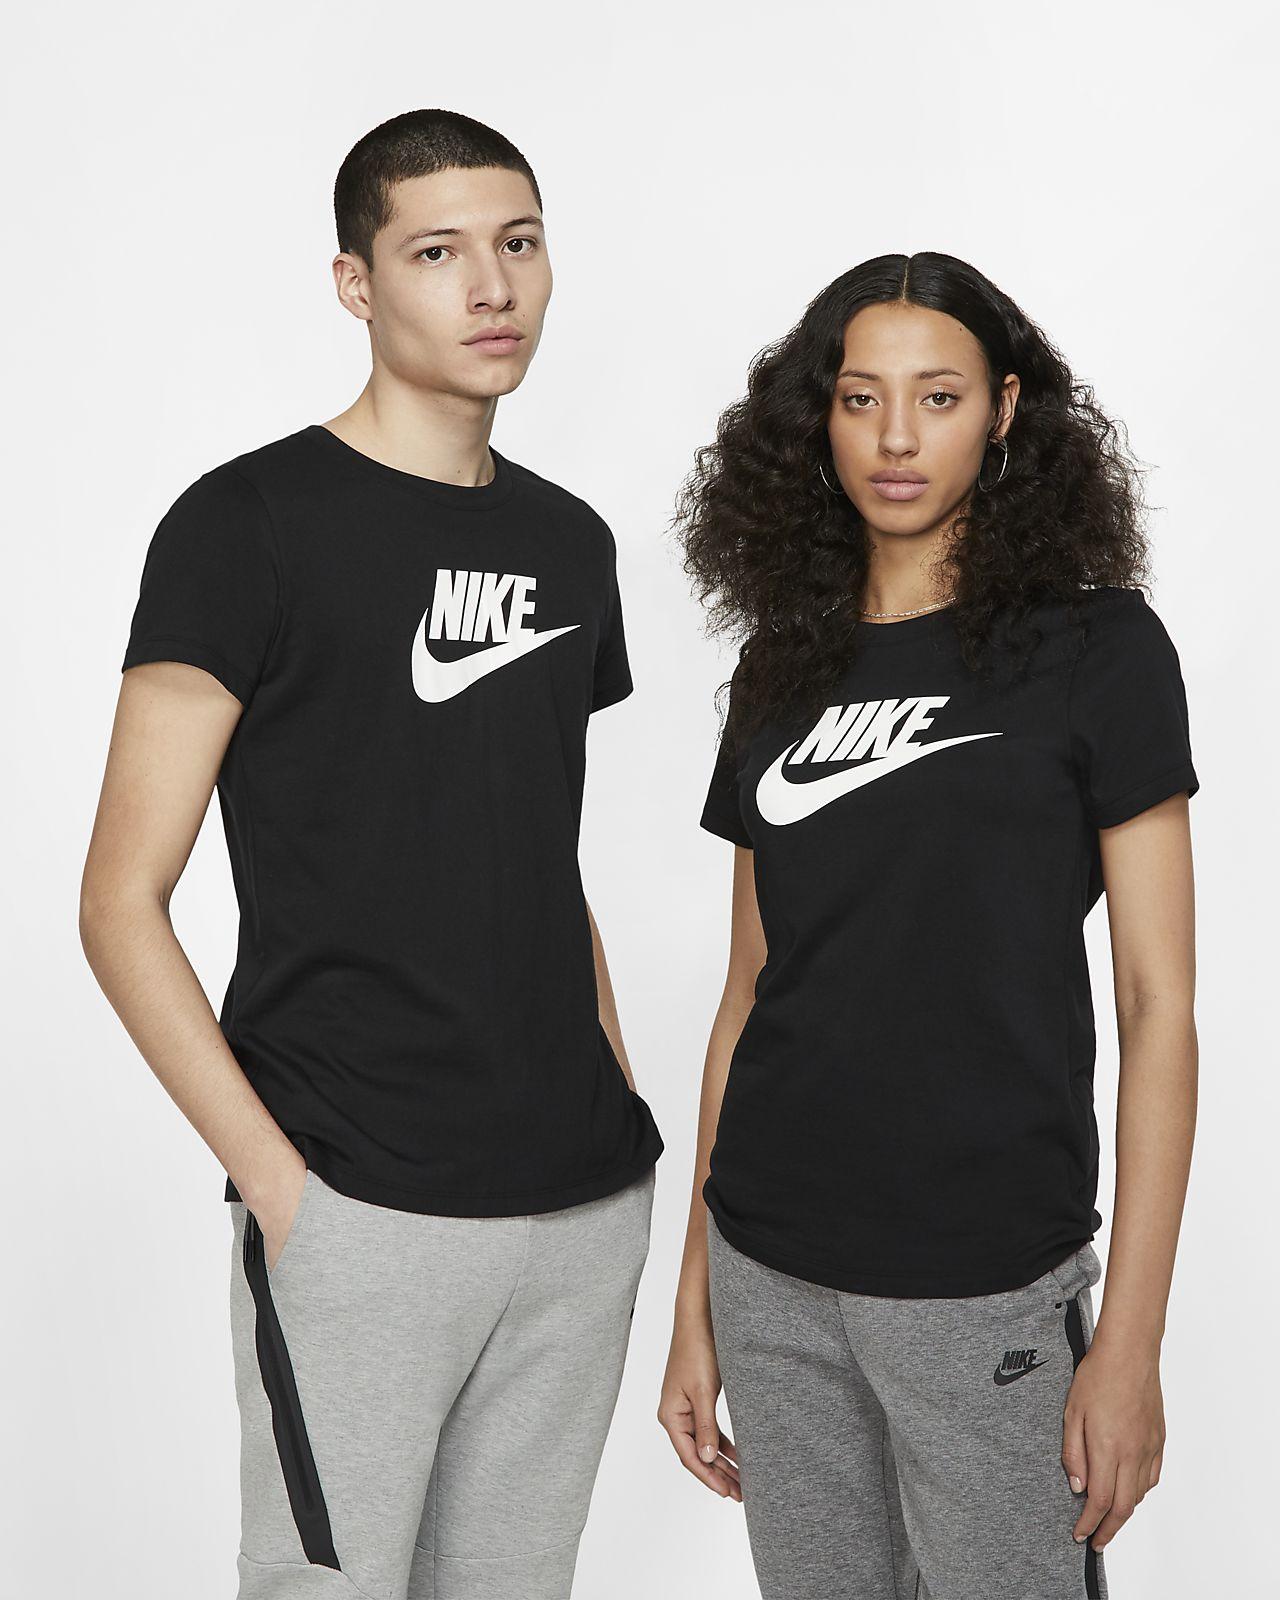 timeless design 4a5a8 9740e Tee-shirt Nike Sportswear Essential pour Femme